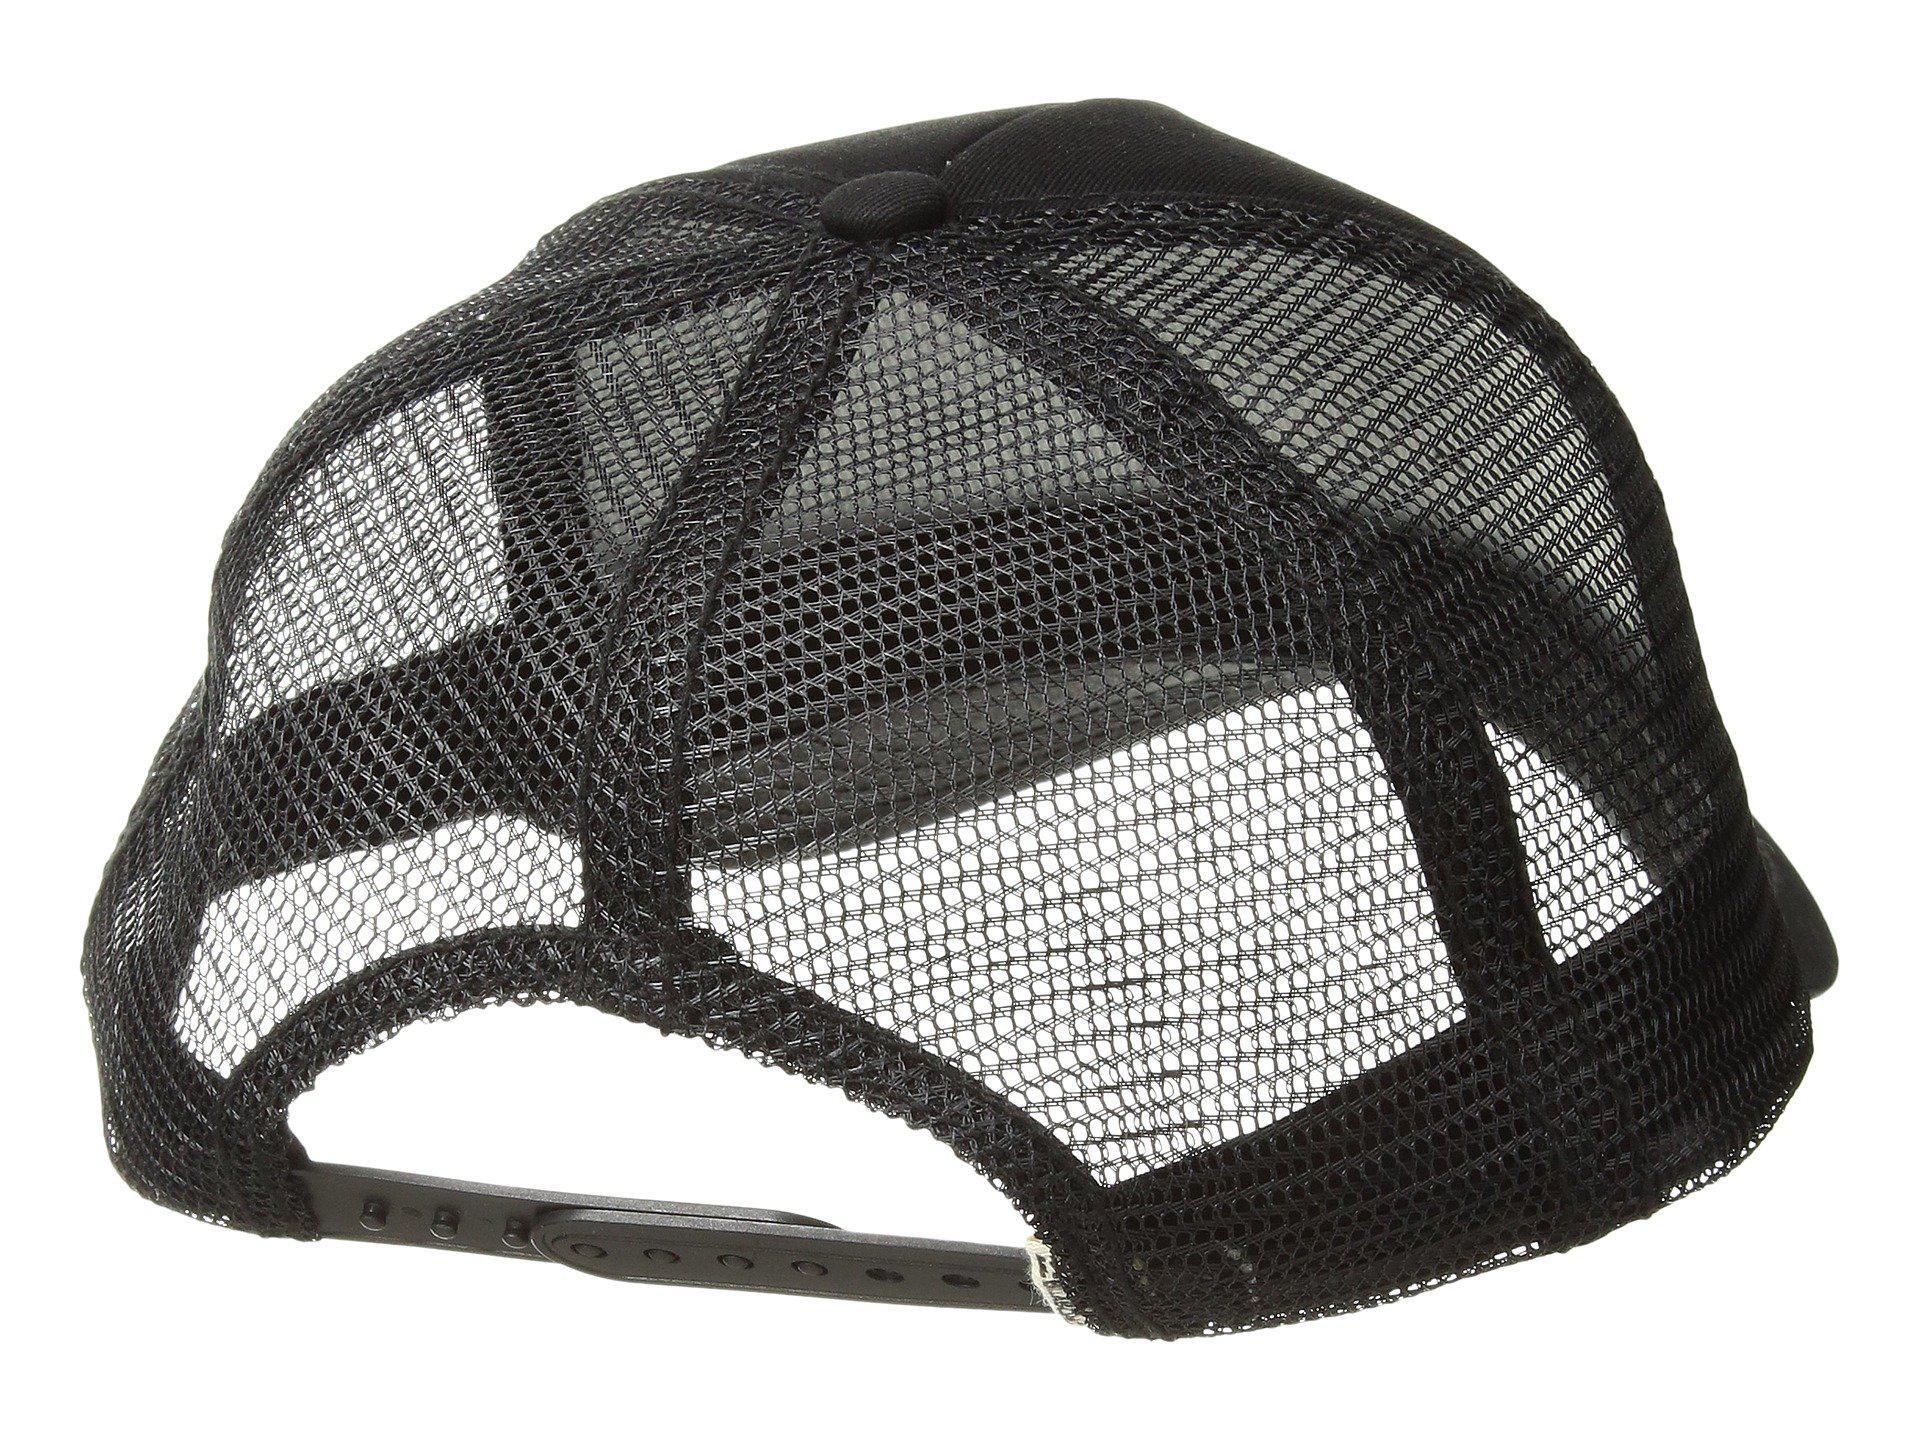 check out 0e8ac 0cd87 ... discount lyst billabong sun your bunz hat geranium caps in black 59282  f321a